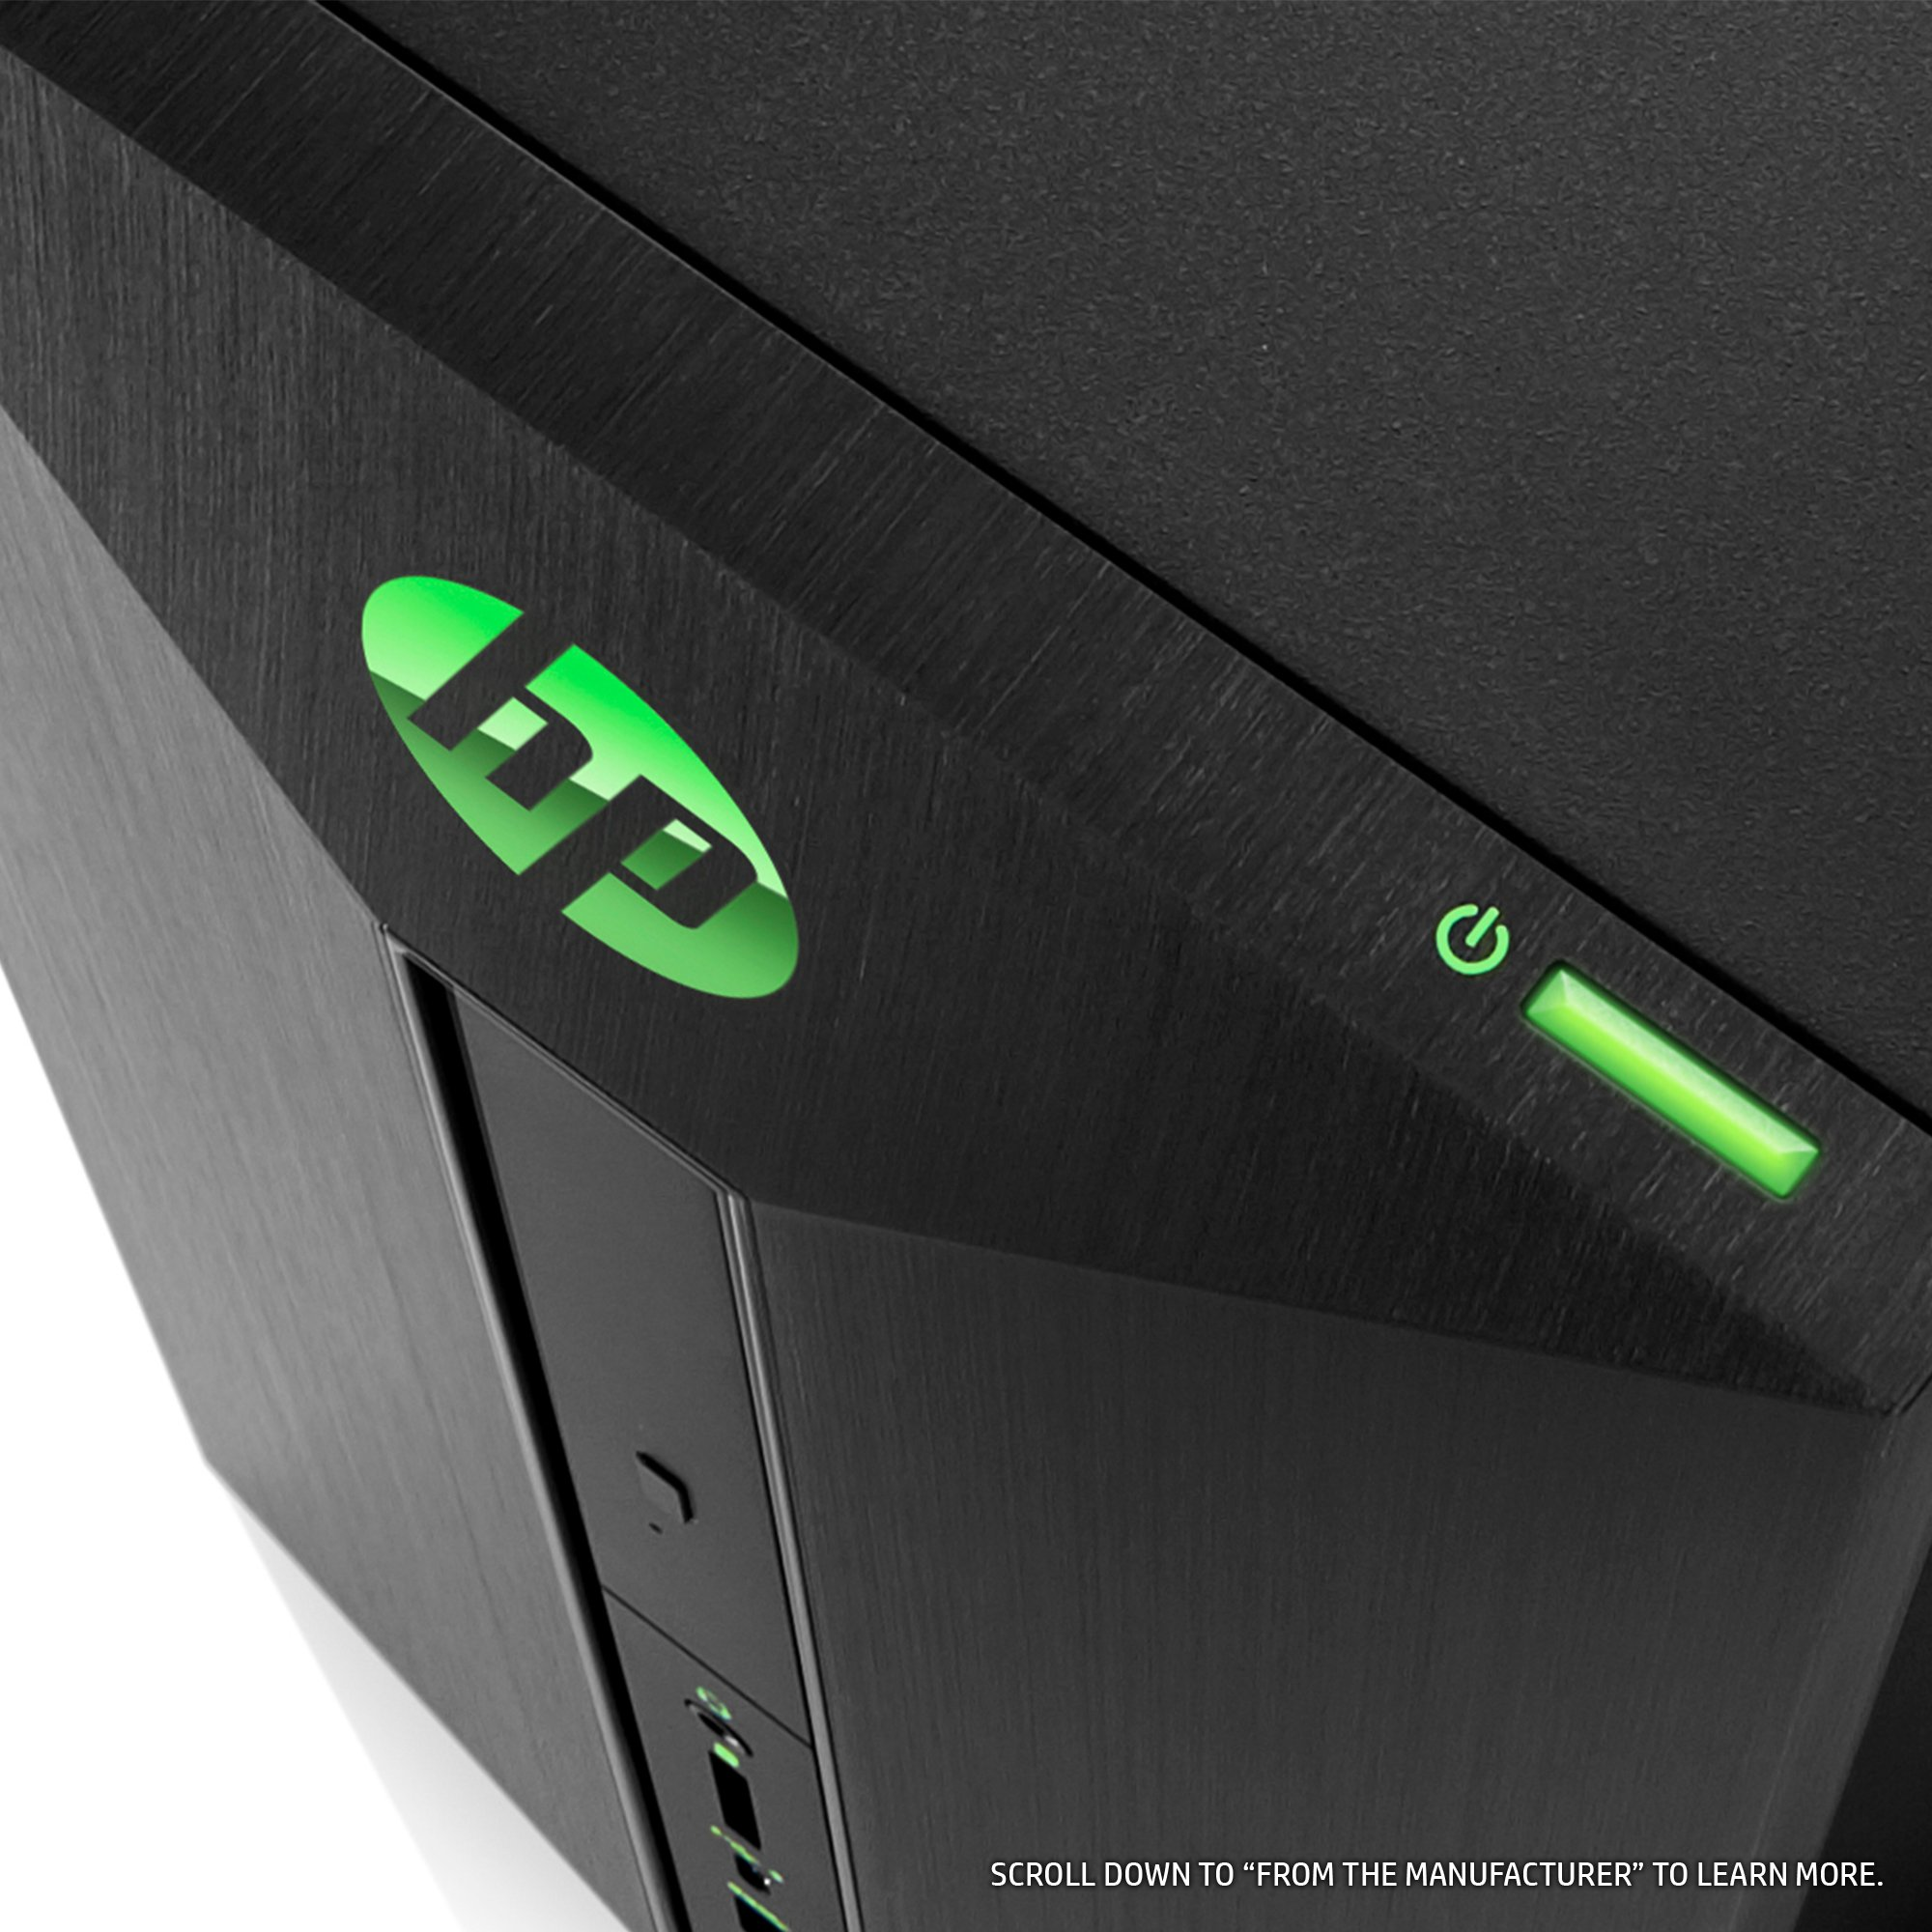 HP Pavilion Power Desktop Computer, Intel Core i7-7700, NVIDIA GeForce GTX 1060, 16GB RAM, 1TB hard drive, 128GB SSD, Windows 10 (580-068, Black) by HP (Image #6)